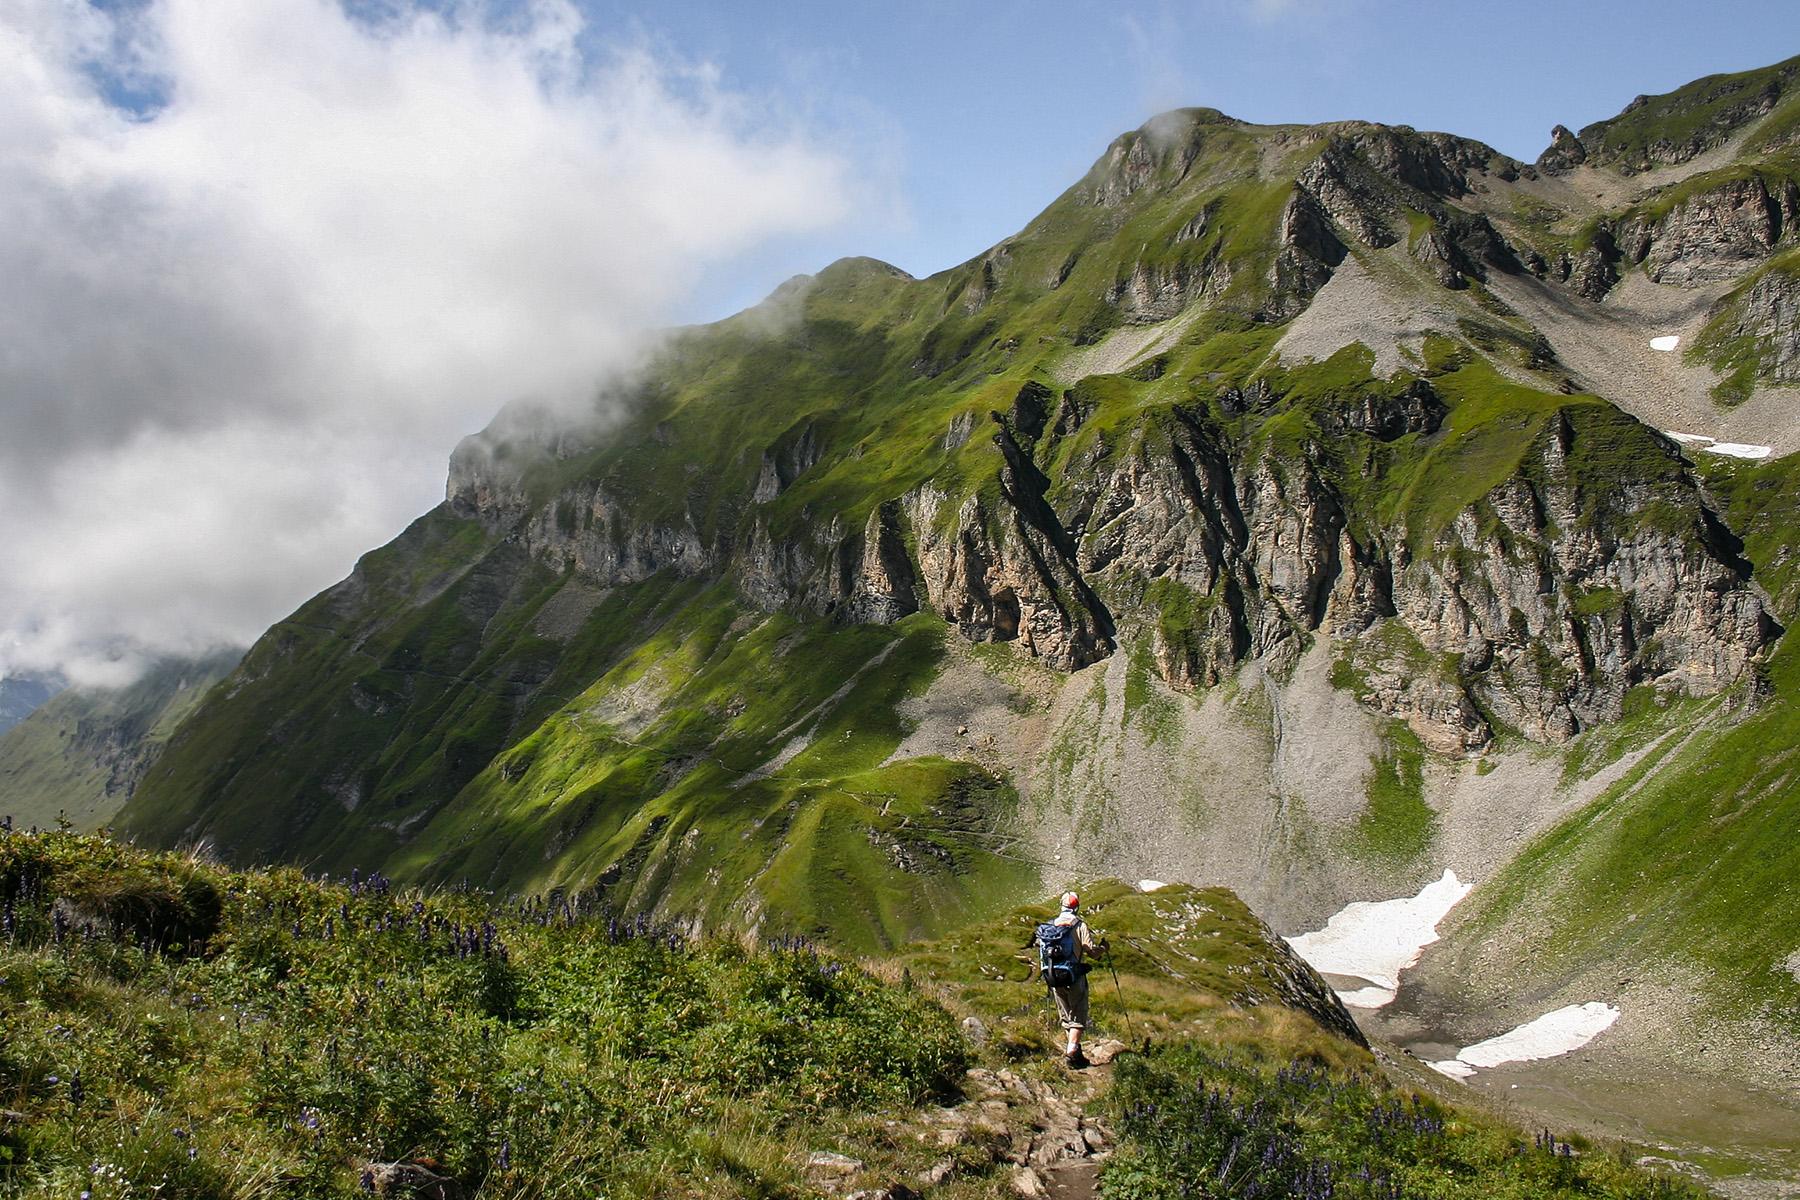 Best hikes in Switzerland: the dramatic landscape of the Interlaken-Oberhasli region